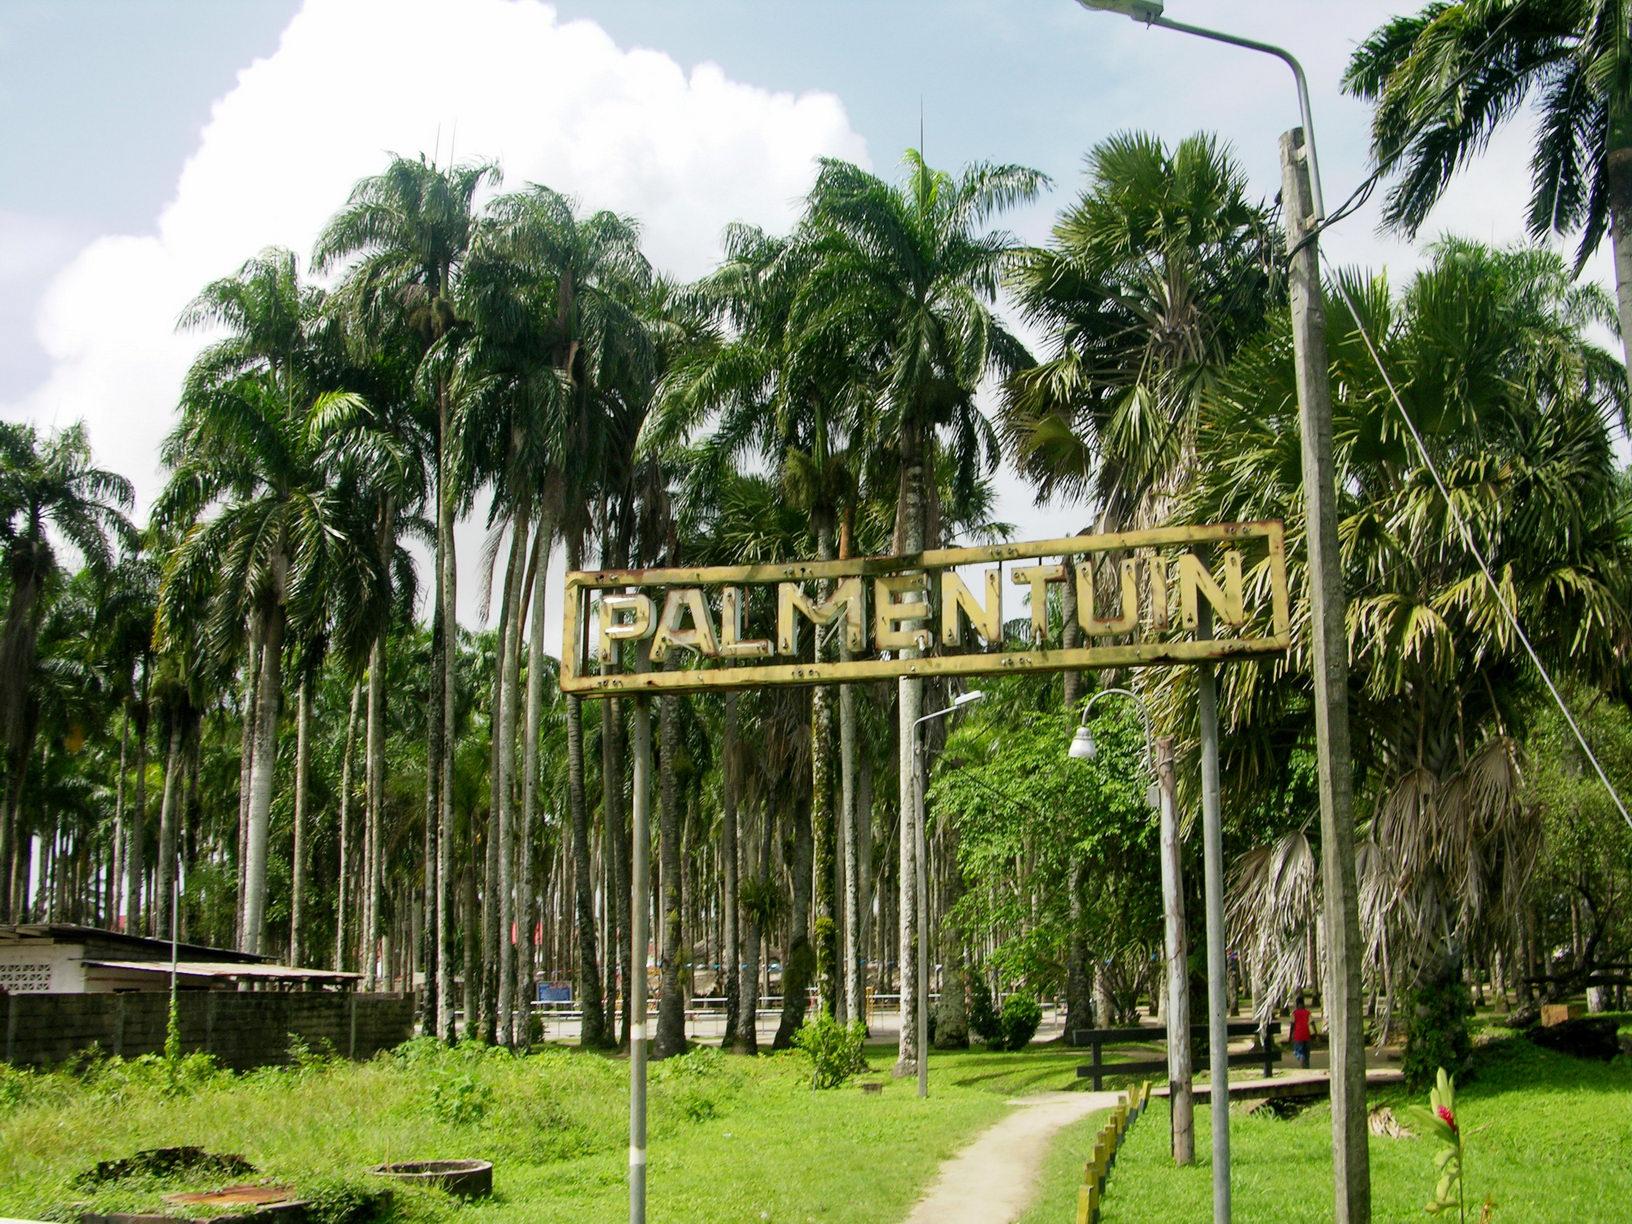 Palmentuin Park, Suriname